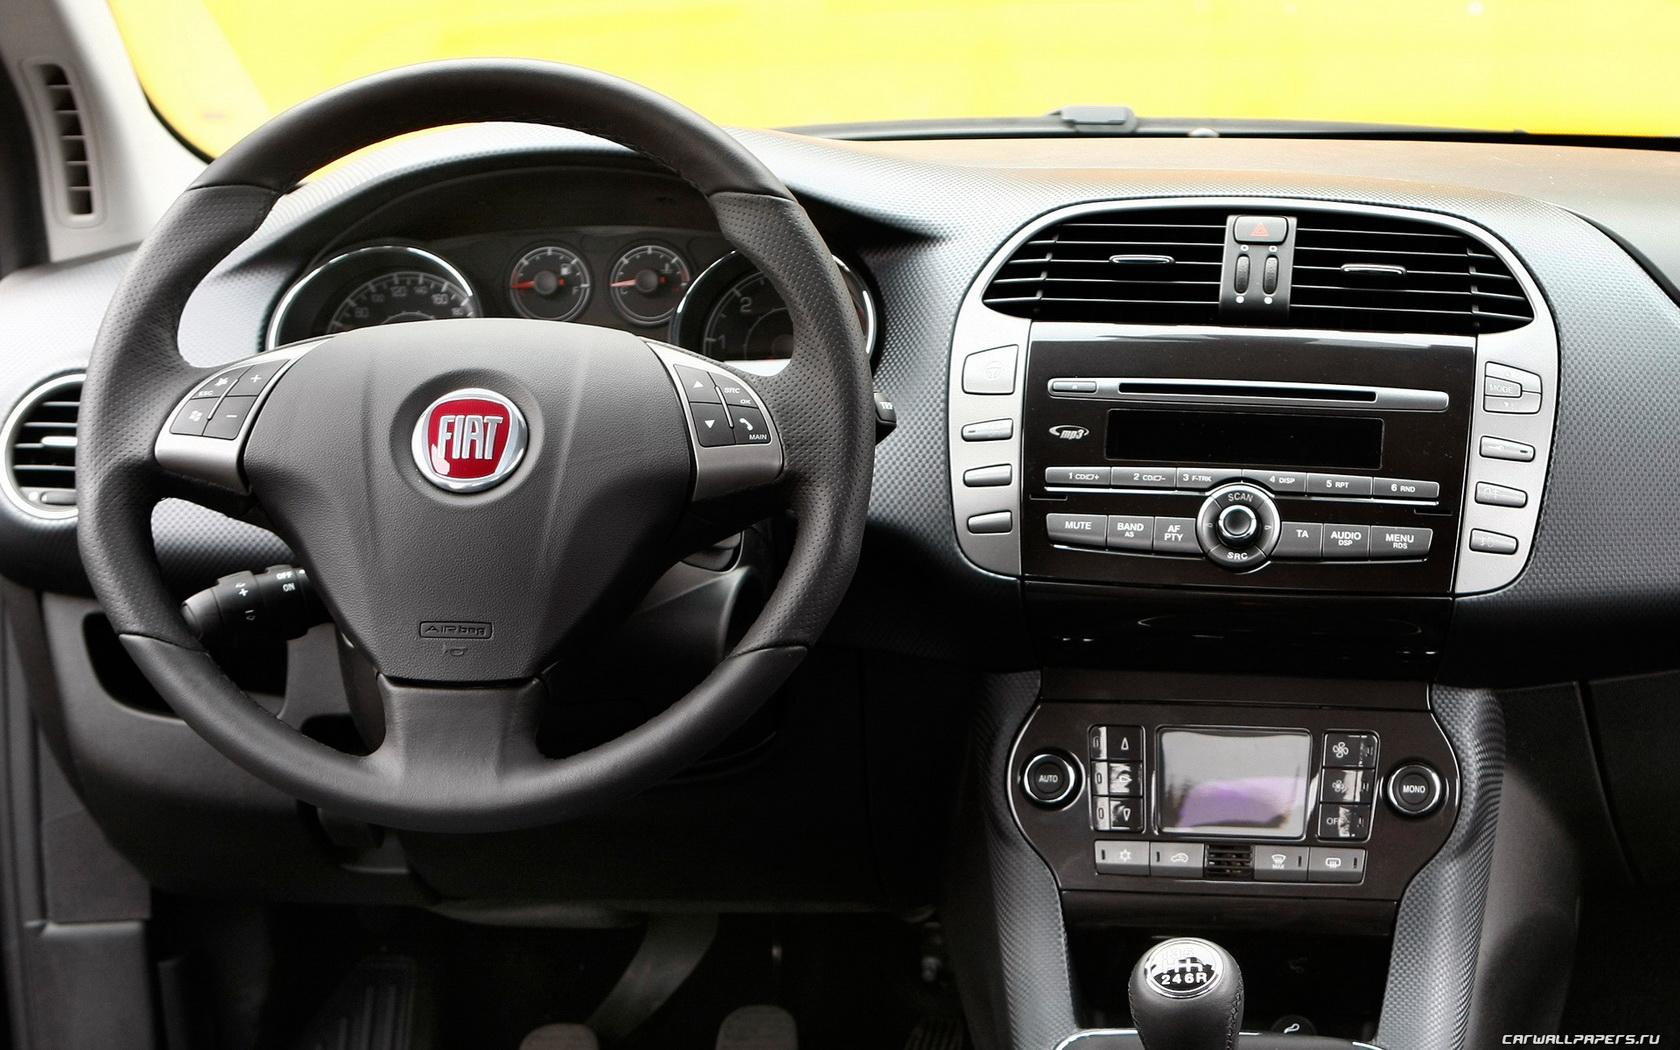 Cars Desktop Wallpapers Fiat Bravo 1 6 Multijet 2008